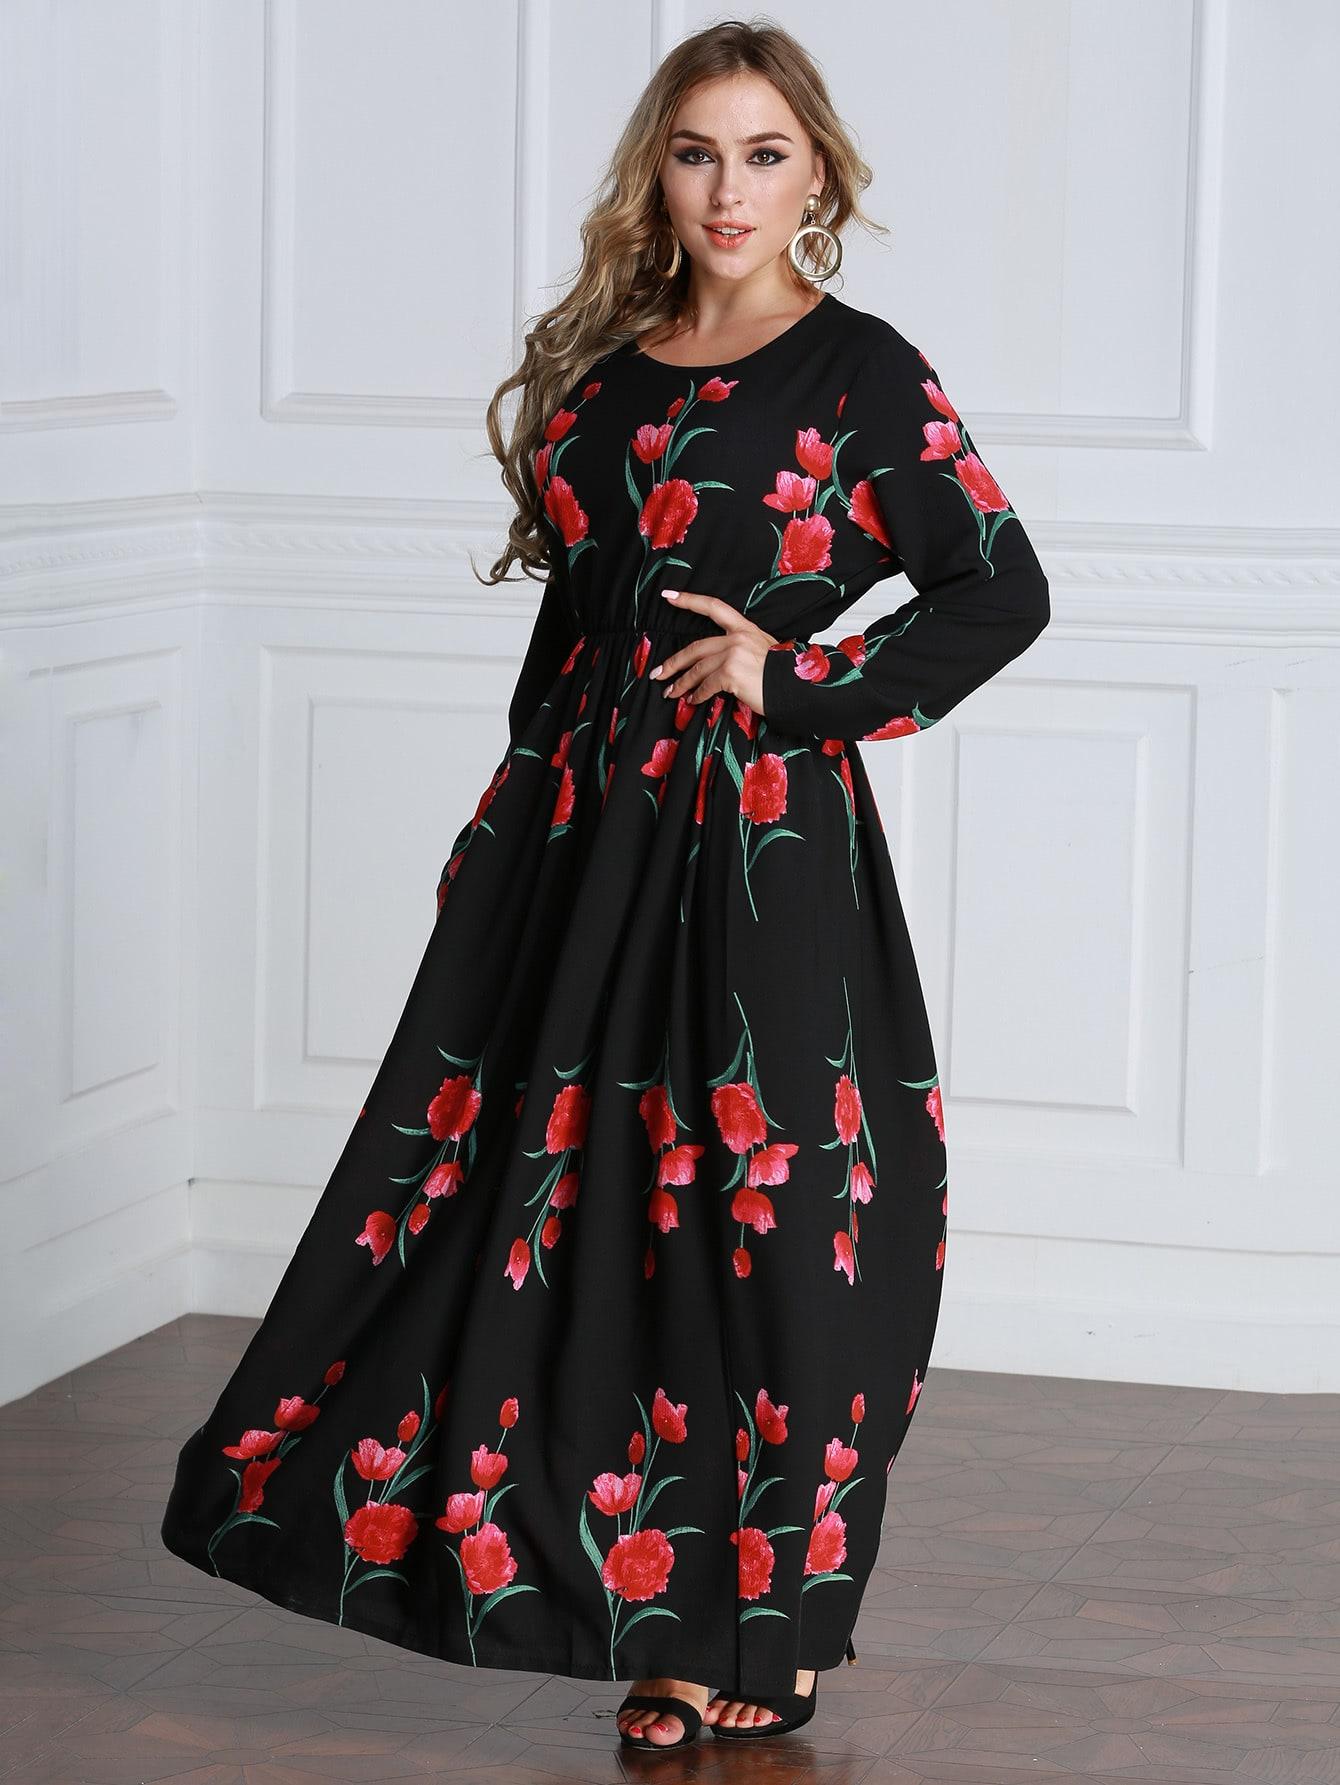 Floral Print Random Maxi Dress random flower print dress